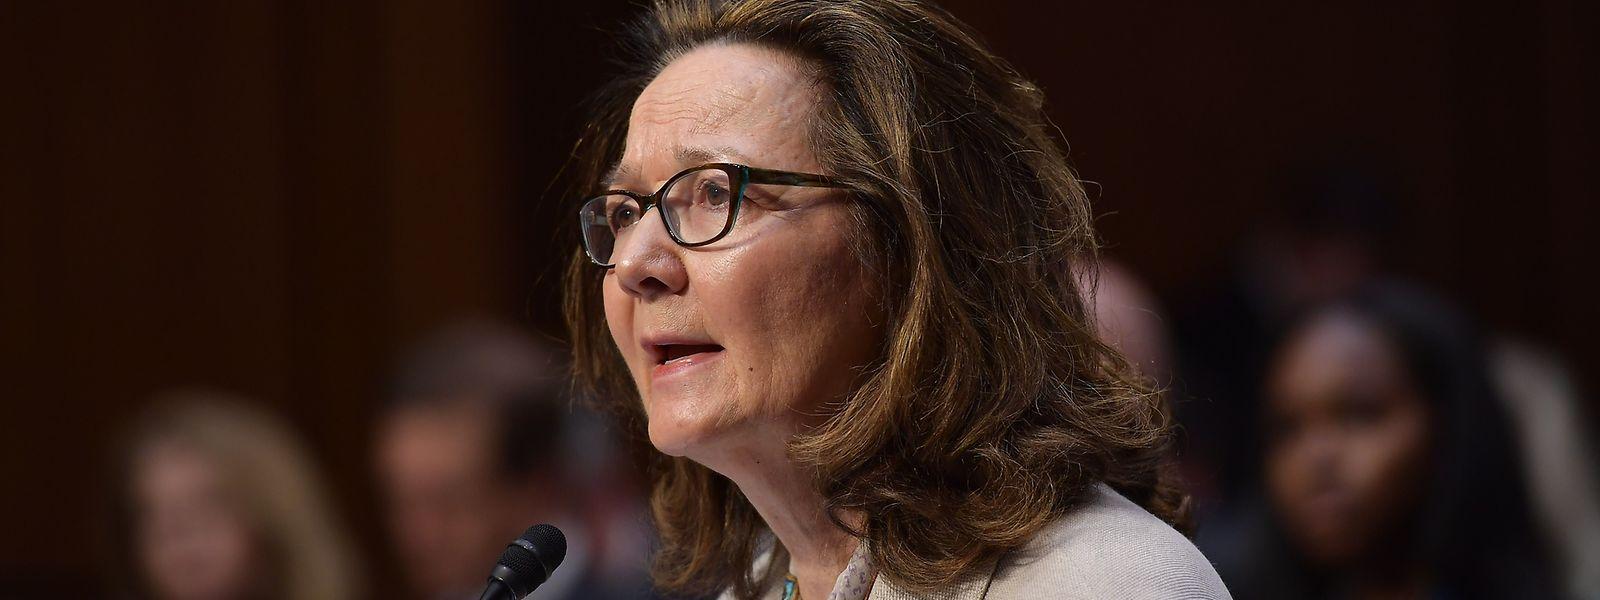 Gina Haspel bei ihrer Anhörung durch den Senat.